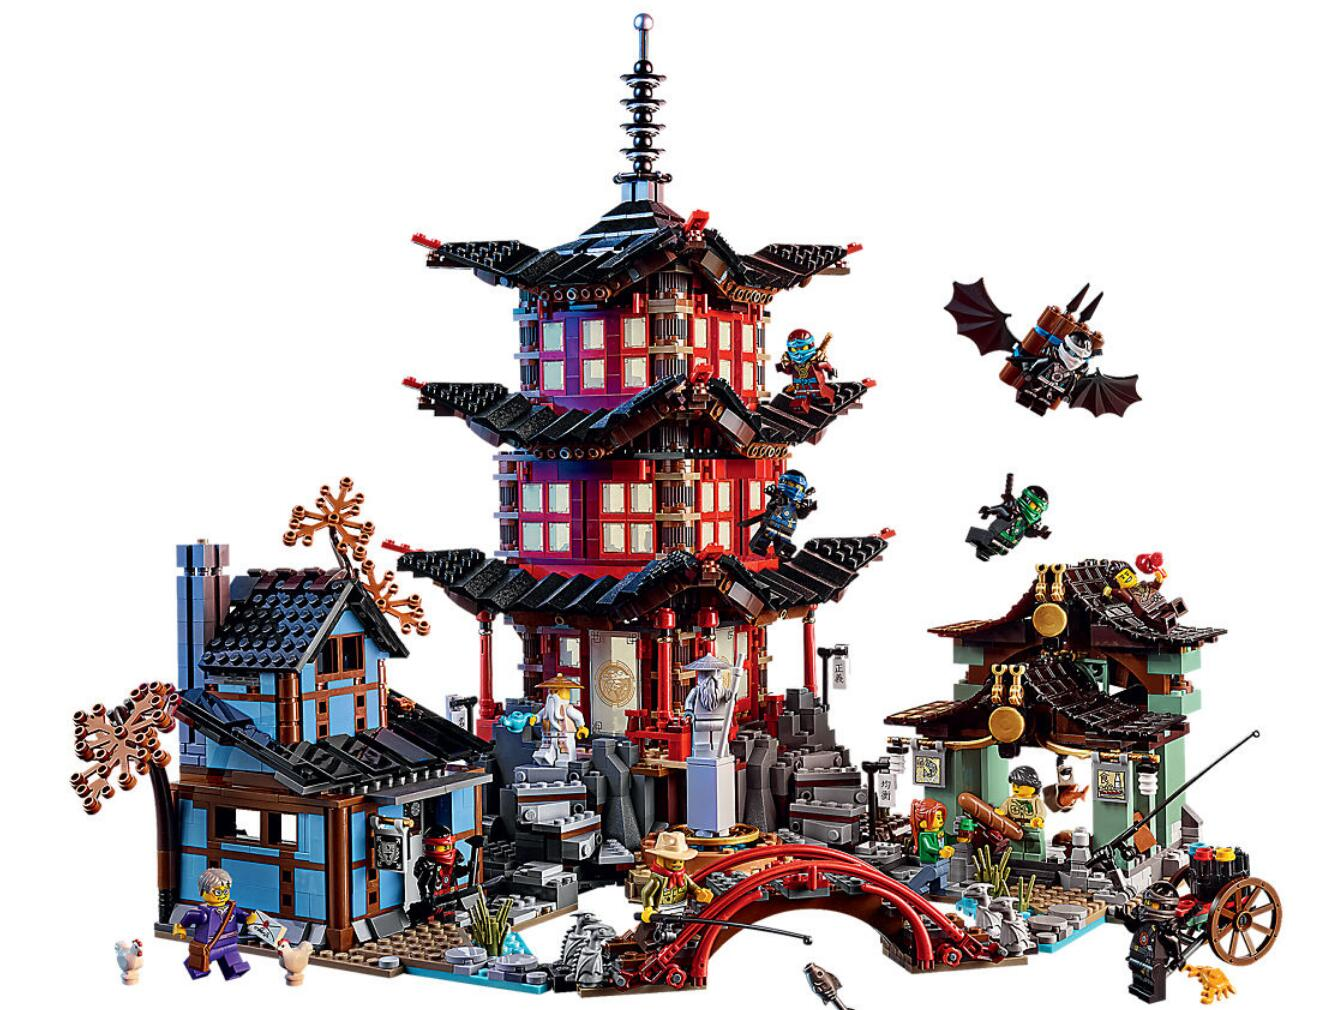 Bela 10427 Ninja Series 70751 Temple of Airjitzu 2051Pcs Building Blocks Toys Compatible With Legoings